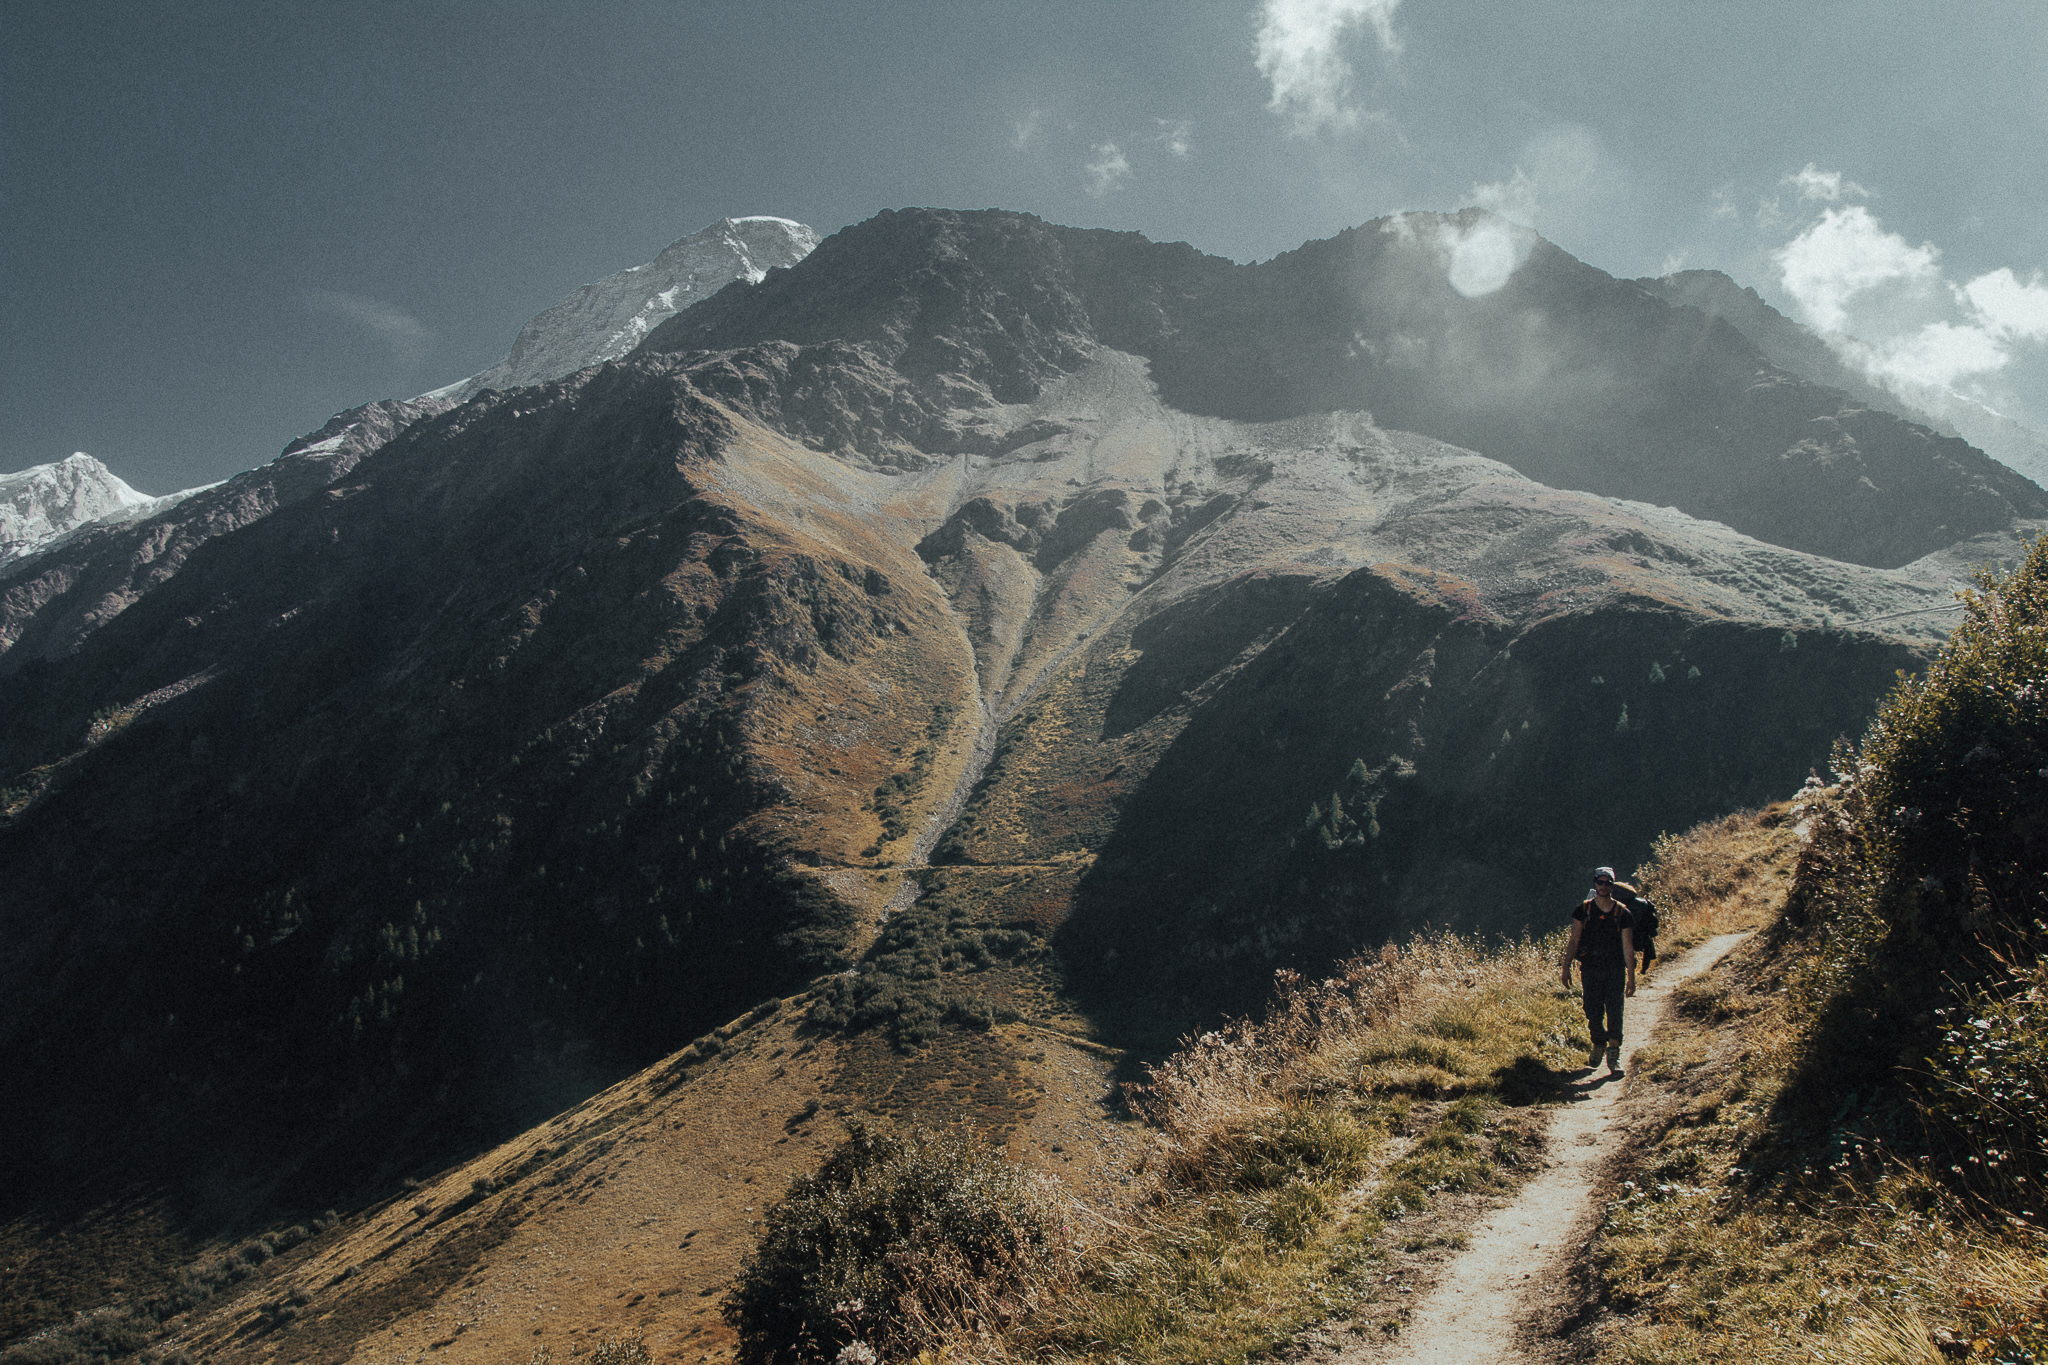 Destination-wedding-photographer-mountains-michal-brzegowy-2.jpg